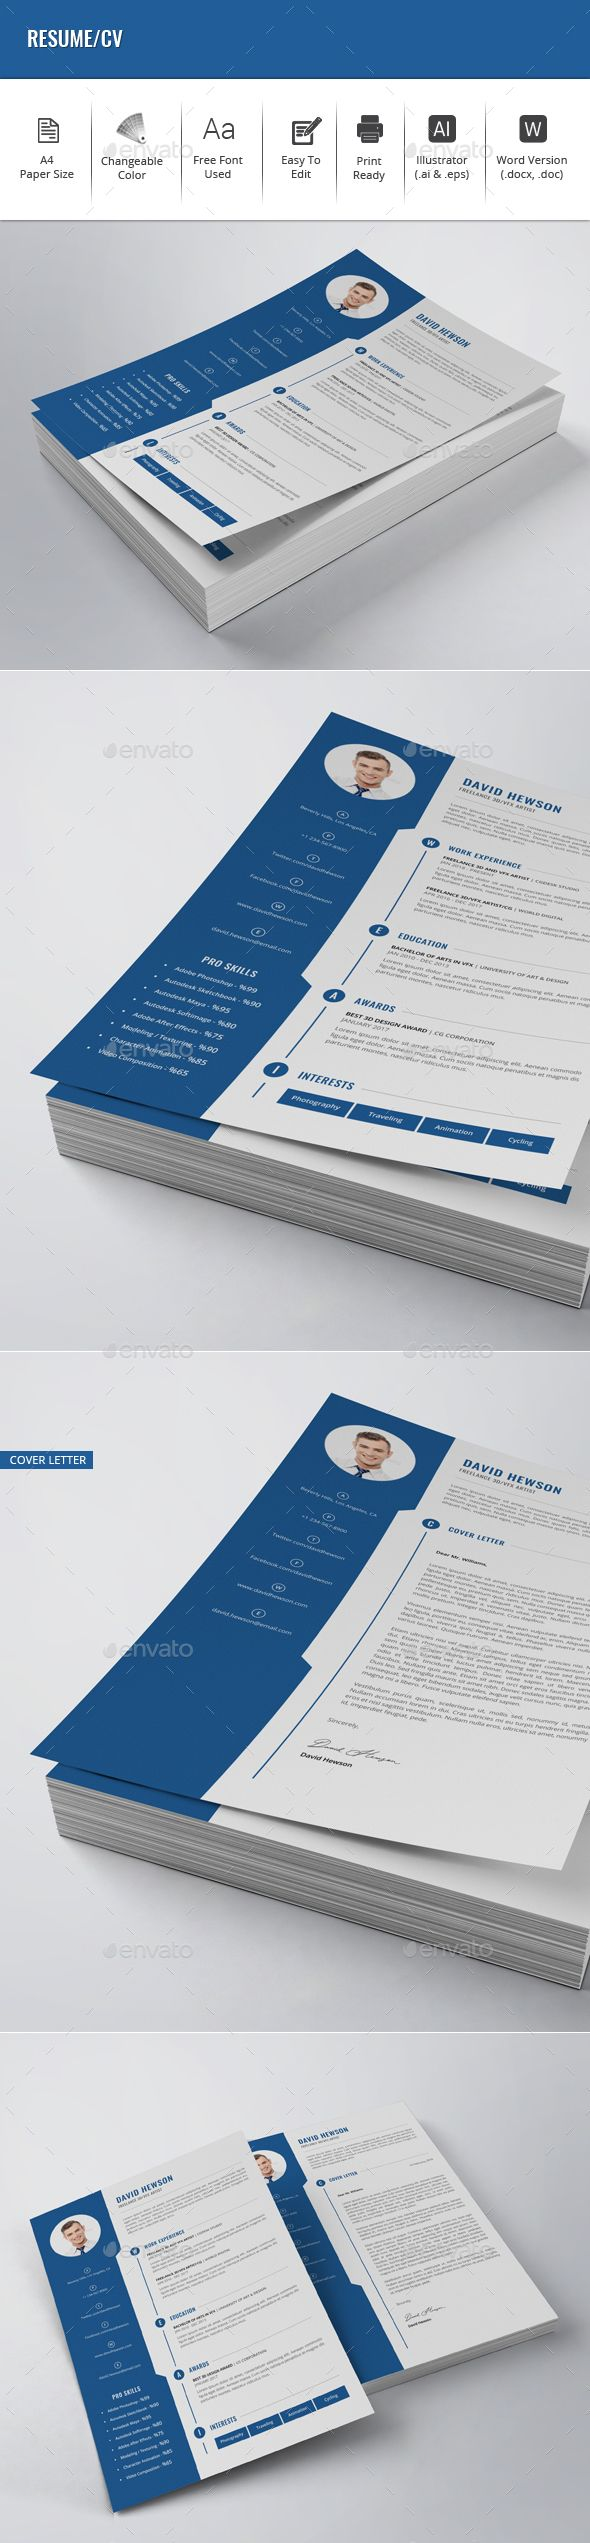 Engineer Cv Templates Microsoft Word%0A Resume   CV Template Vector EPS  AI Illustrator  MS Word